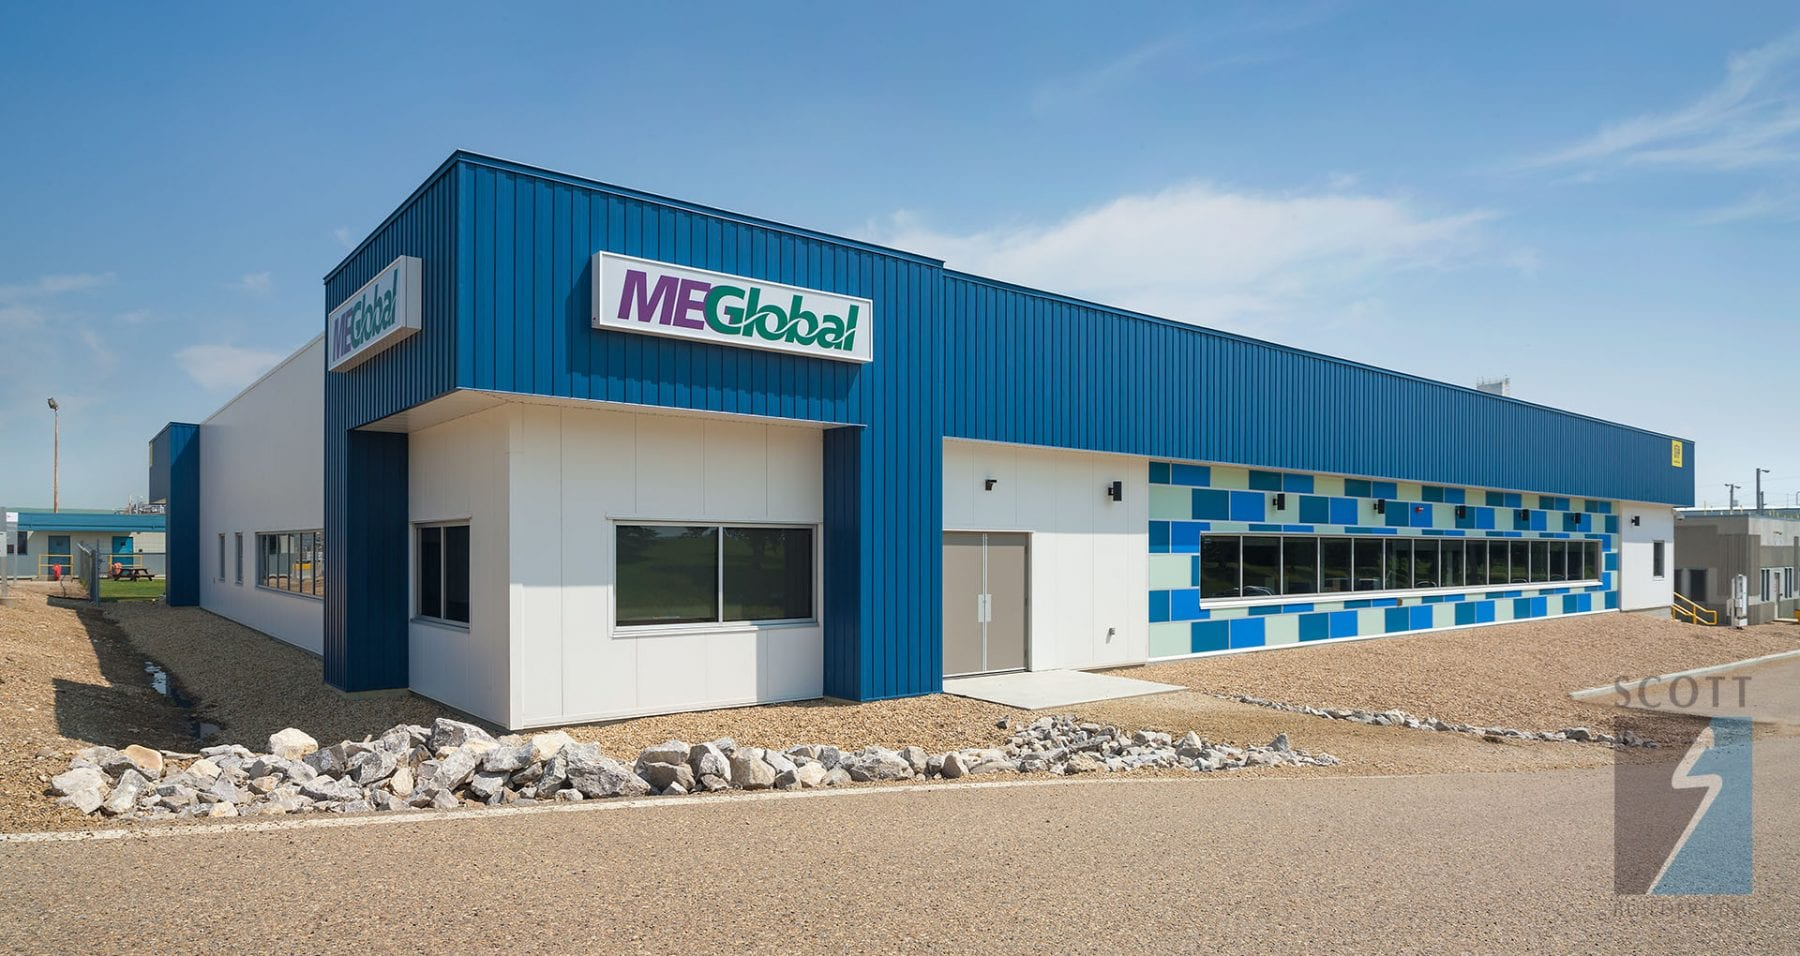 MEGlobal1